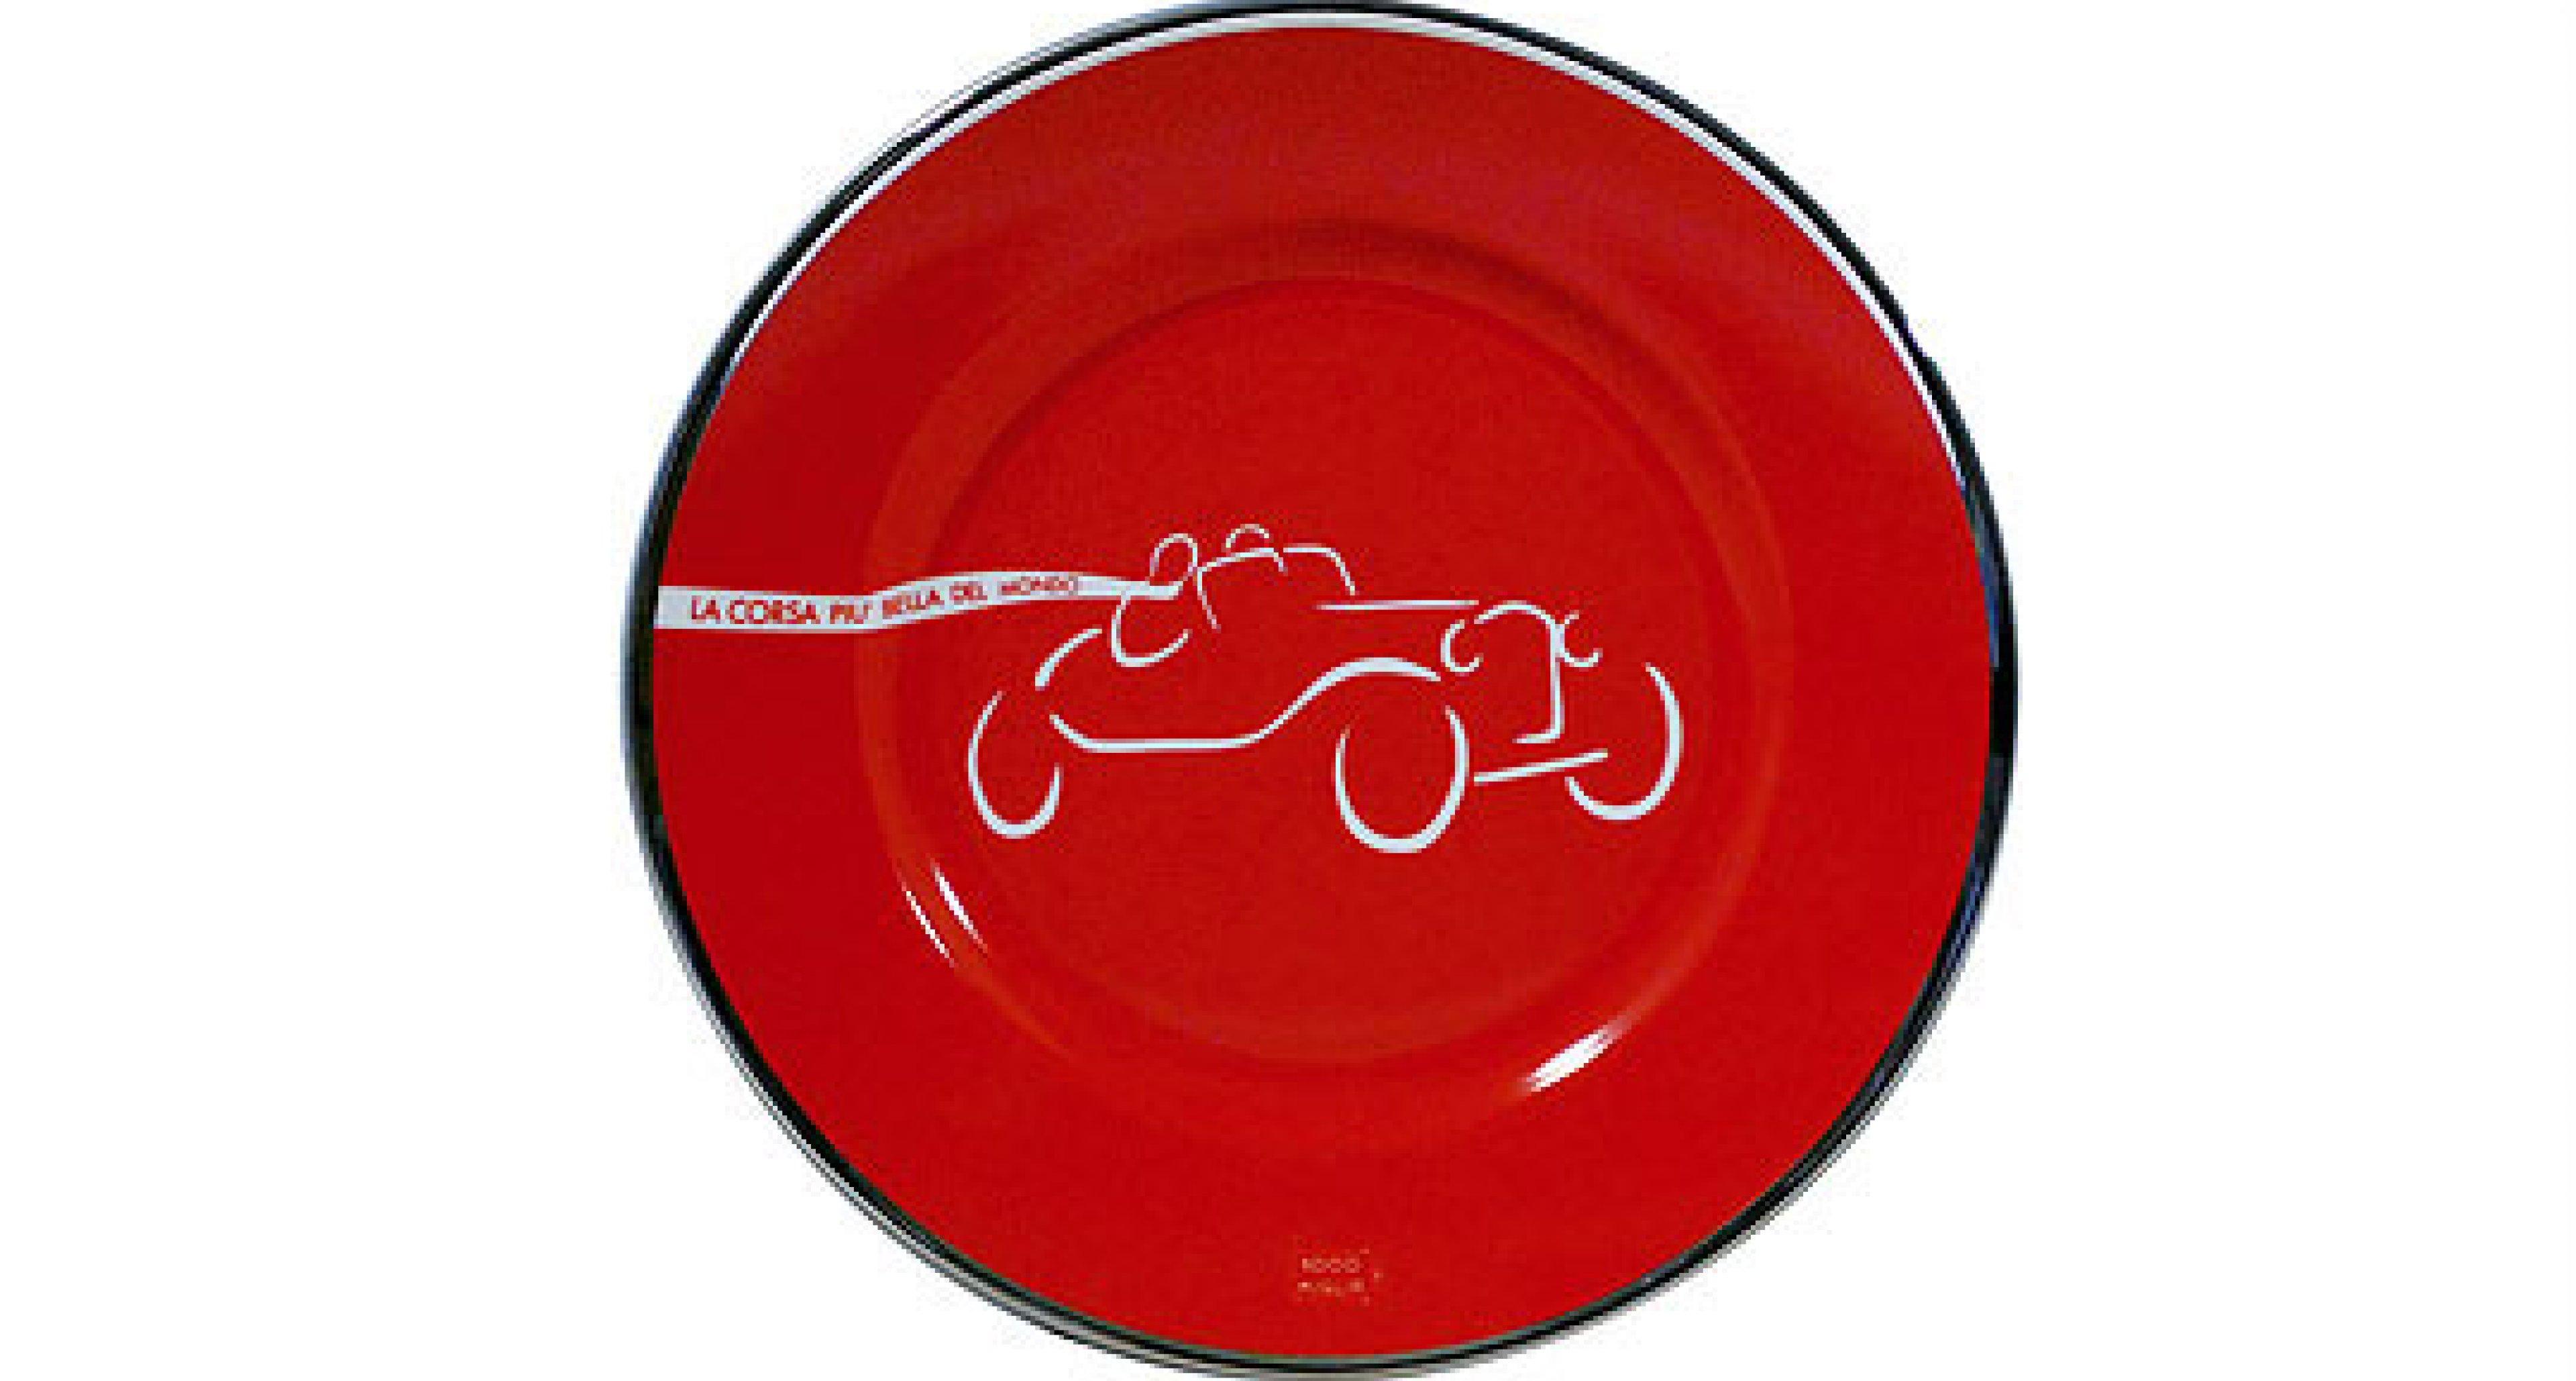 Richard Ginori Porzellan: Mille Miglia Picknick-Edition